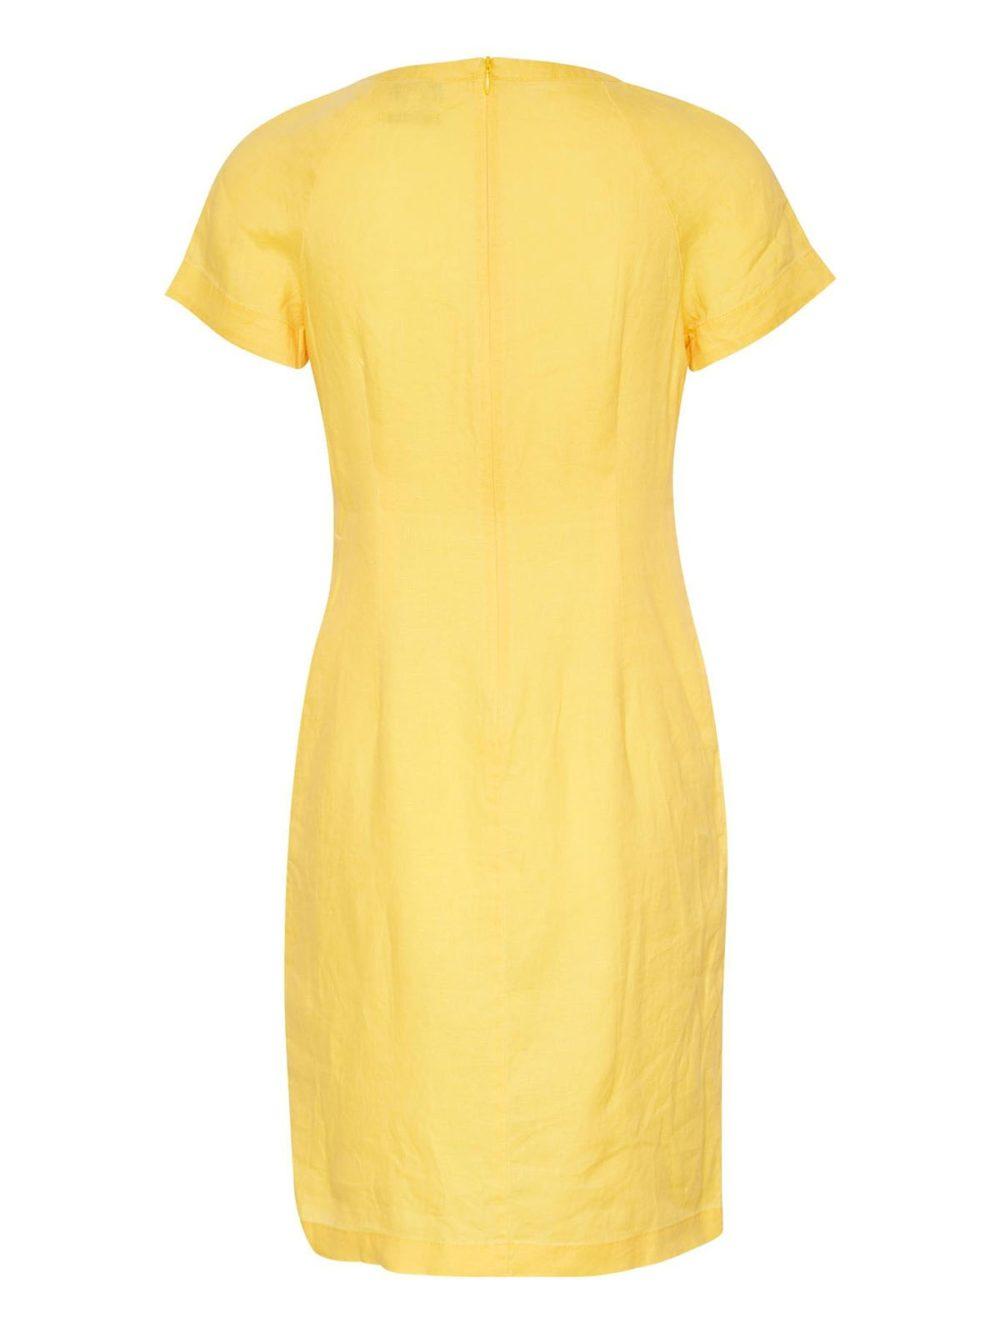 Aundreas Dress Part Two Katie Kerr Women's Clothing